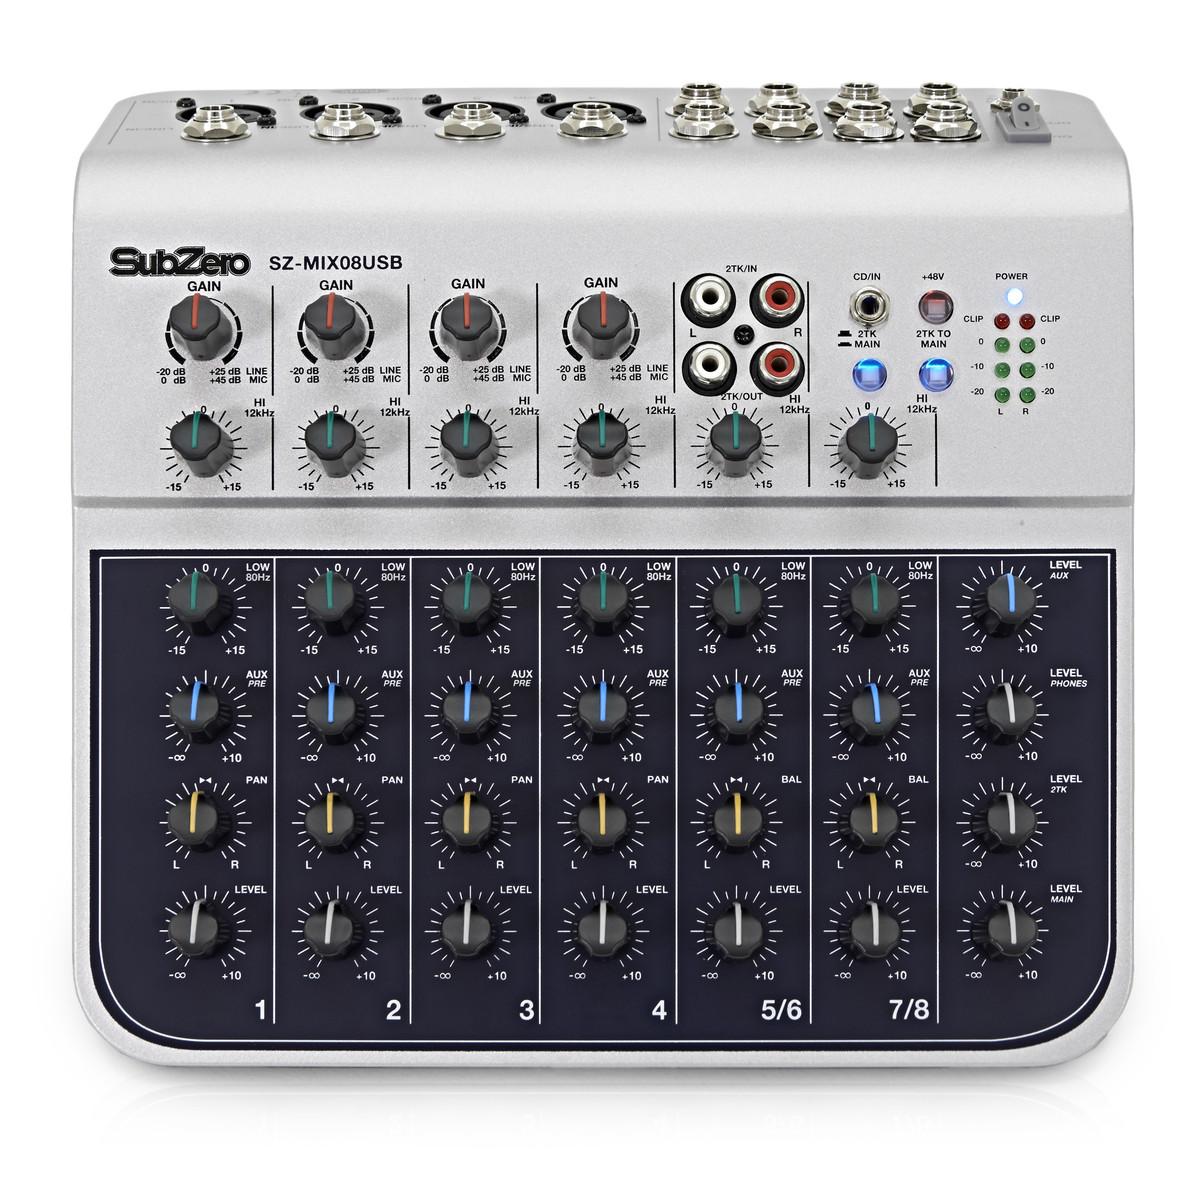 SubZero SZ-MIX08USB 8-Channel USB Mixer/Interface